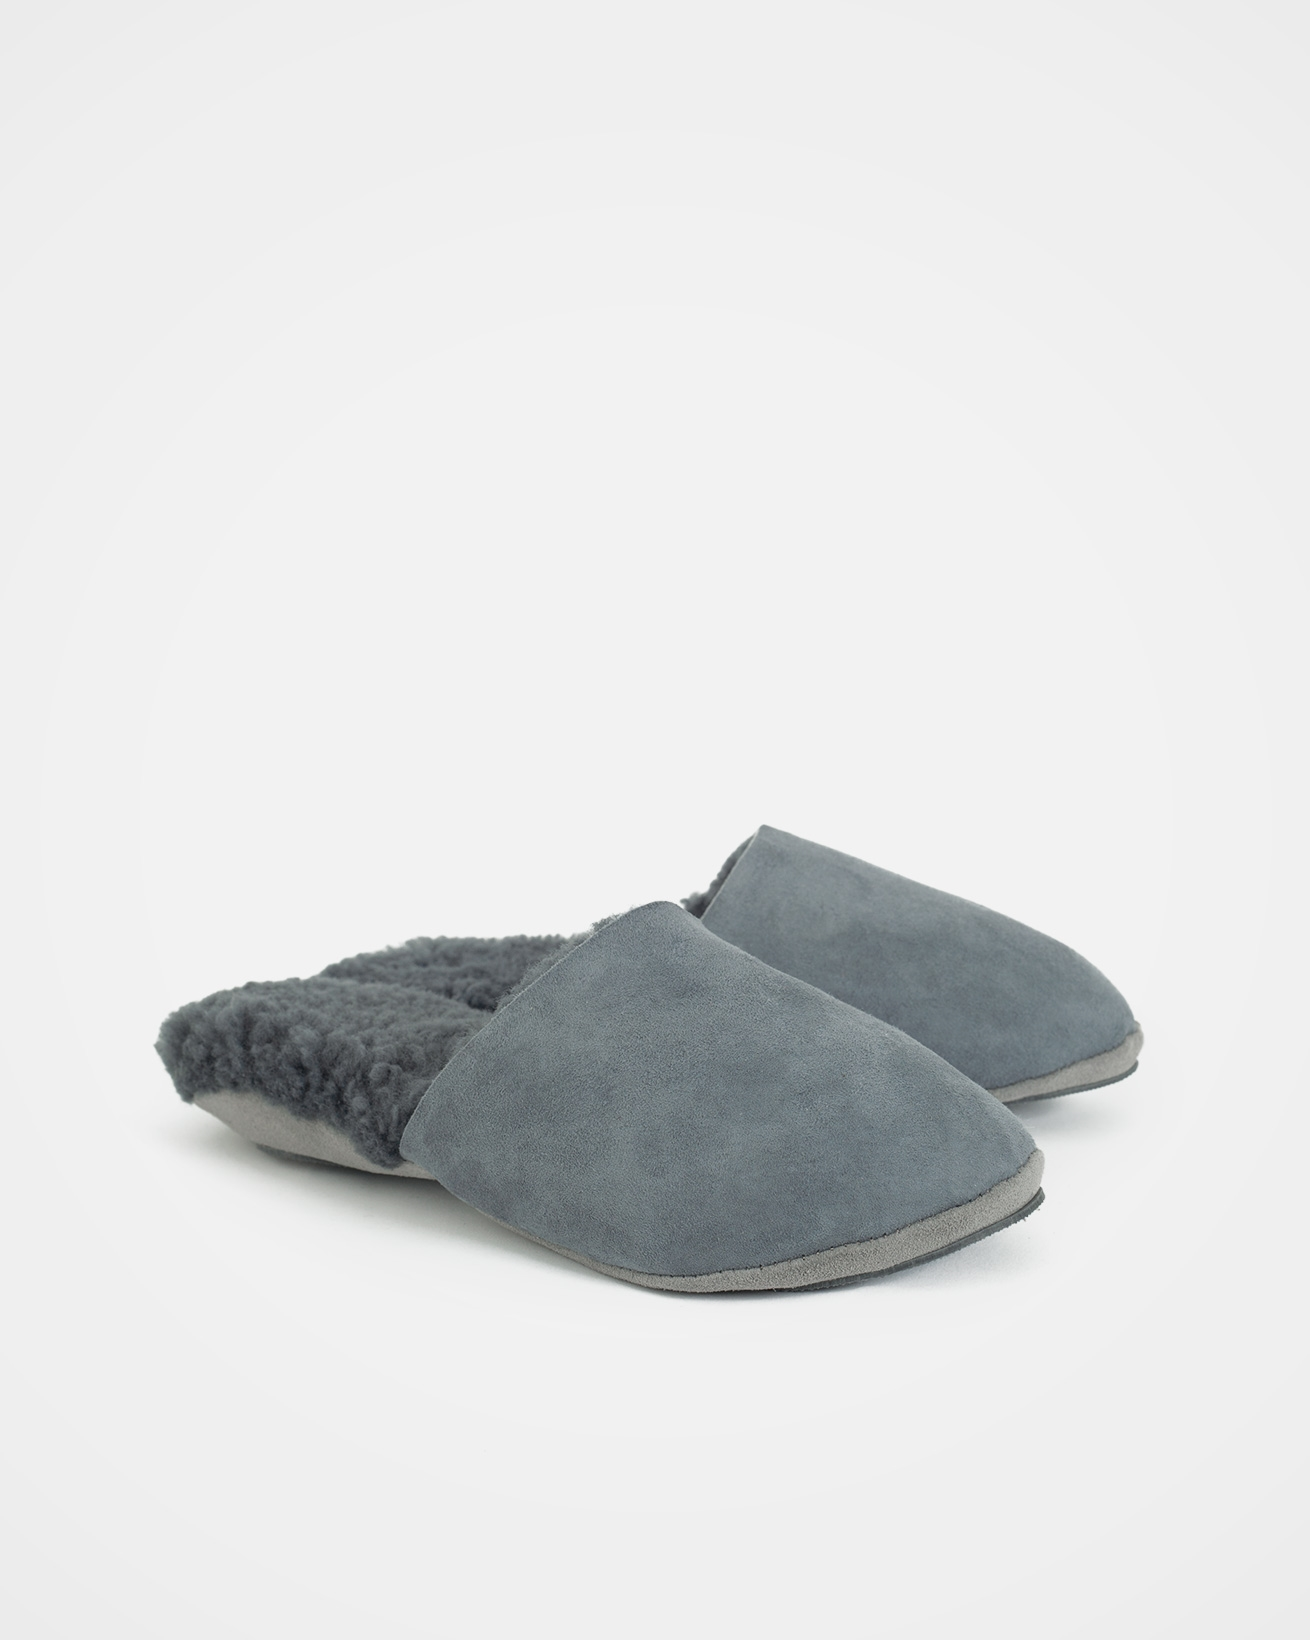 Turned Mules - Size 6 - Dark Grey - 1594